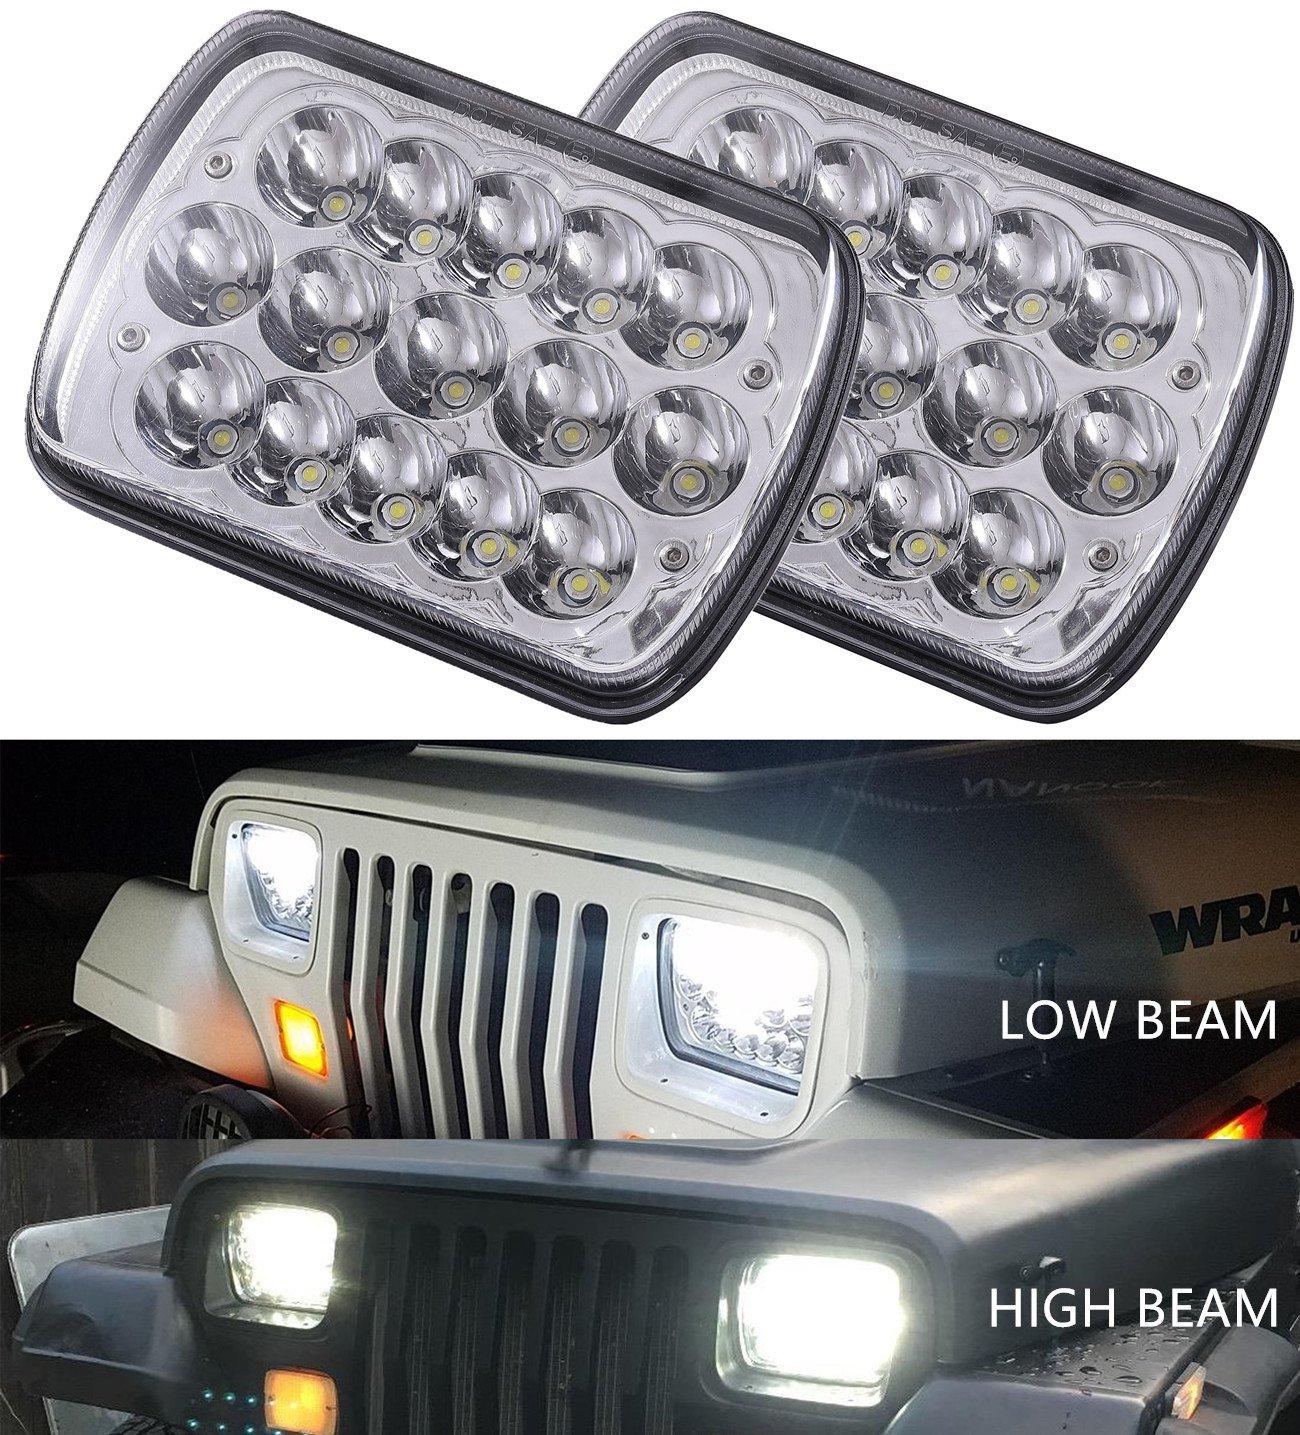 2pcs Dot Approved 5x7 6x7inch 45w Rectangular Sealed 1992 Toyota 4runner Projector Lights Beam Led Headlights For Jeep Wrangler Yj Cherokee Xj Trucks 4x4 Offroad Headlamp